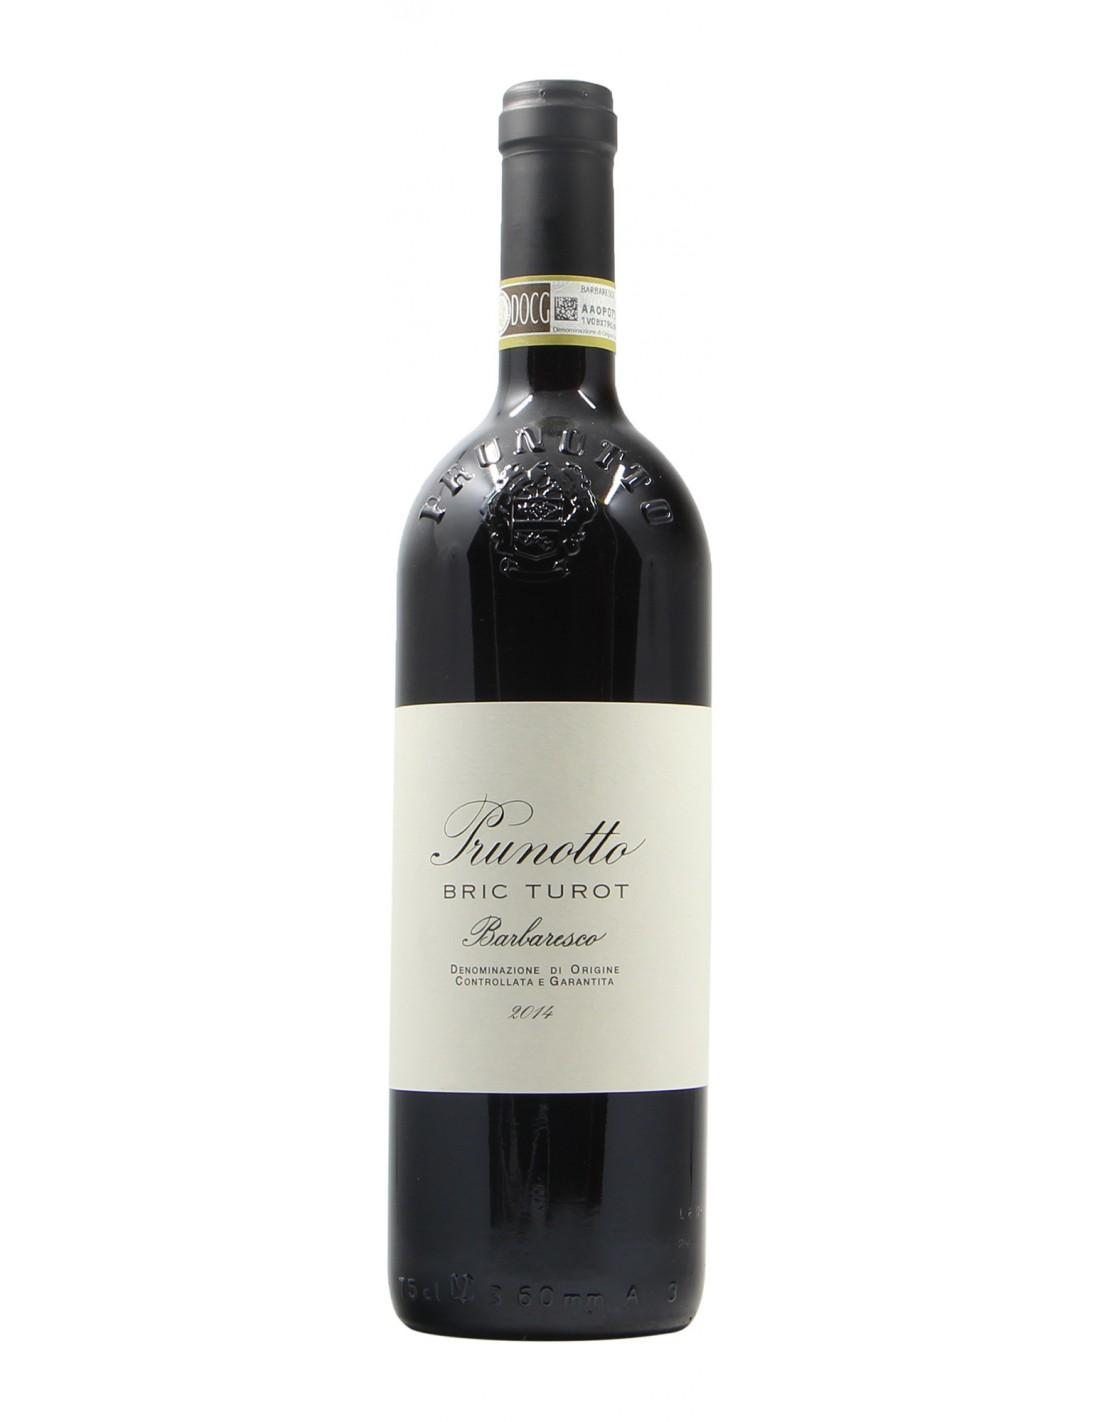 BARBARESCO BRIC TUROT 2014 PRUNOTTO Grandi Bottiglie